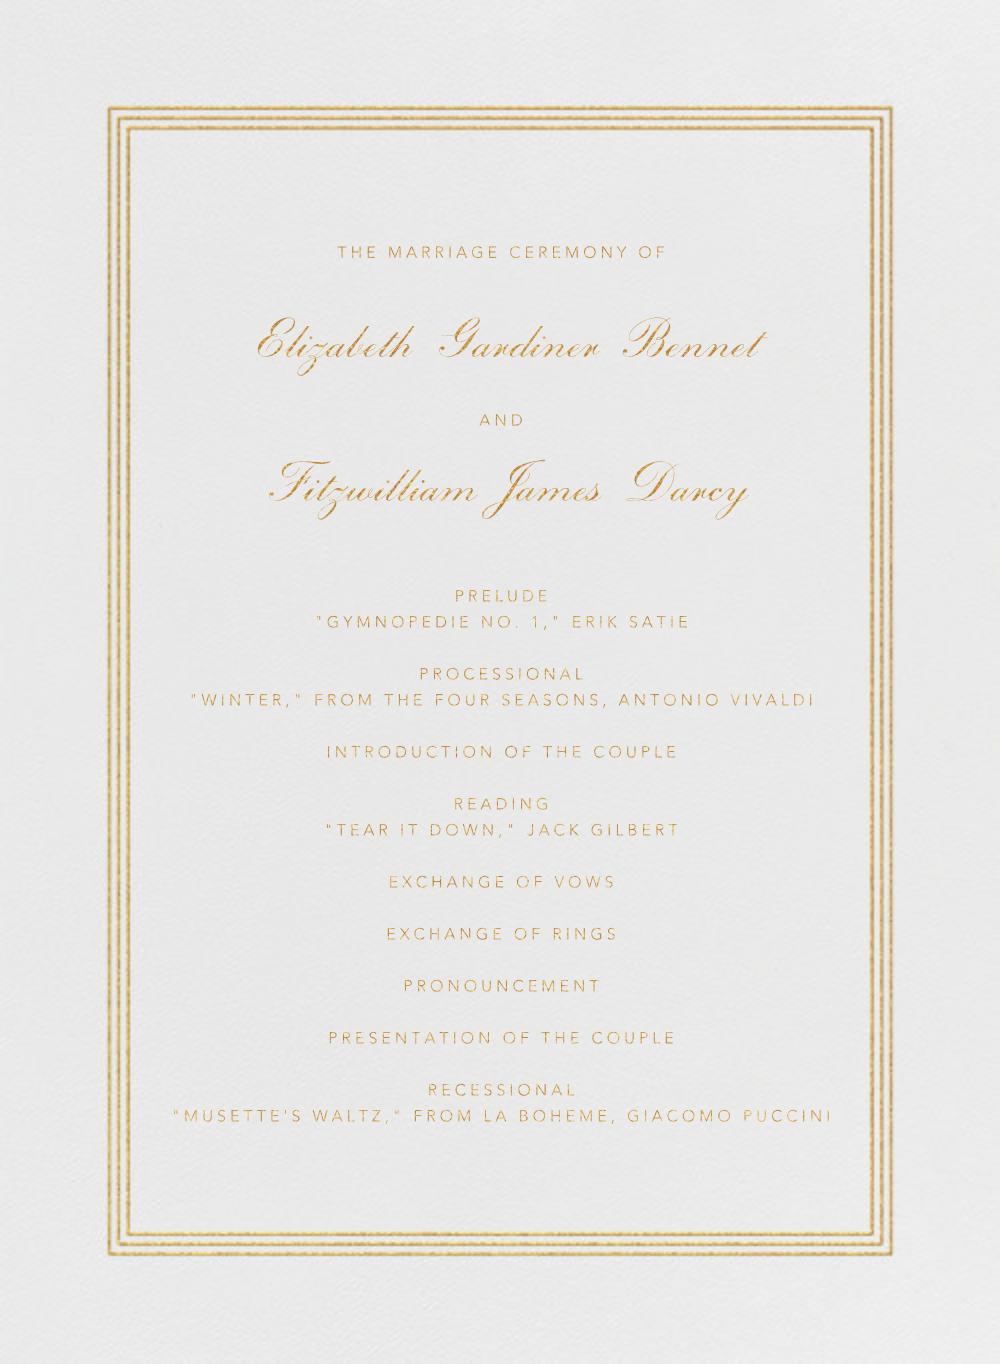 Whitby (Program) - Medium Gold - Paperless Post - Menus and programs